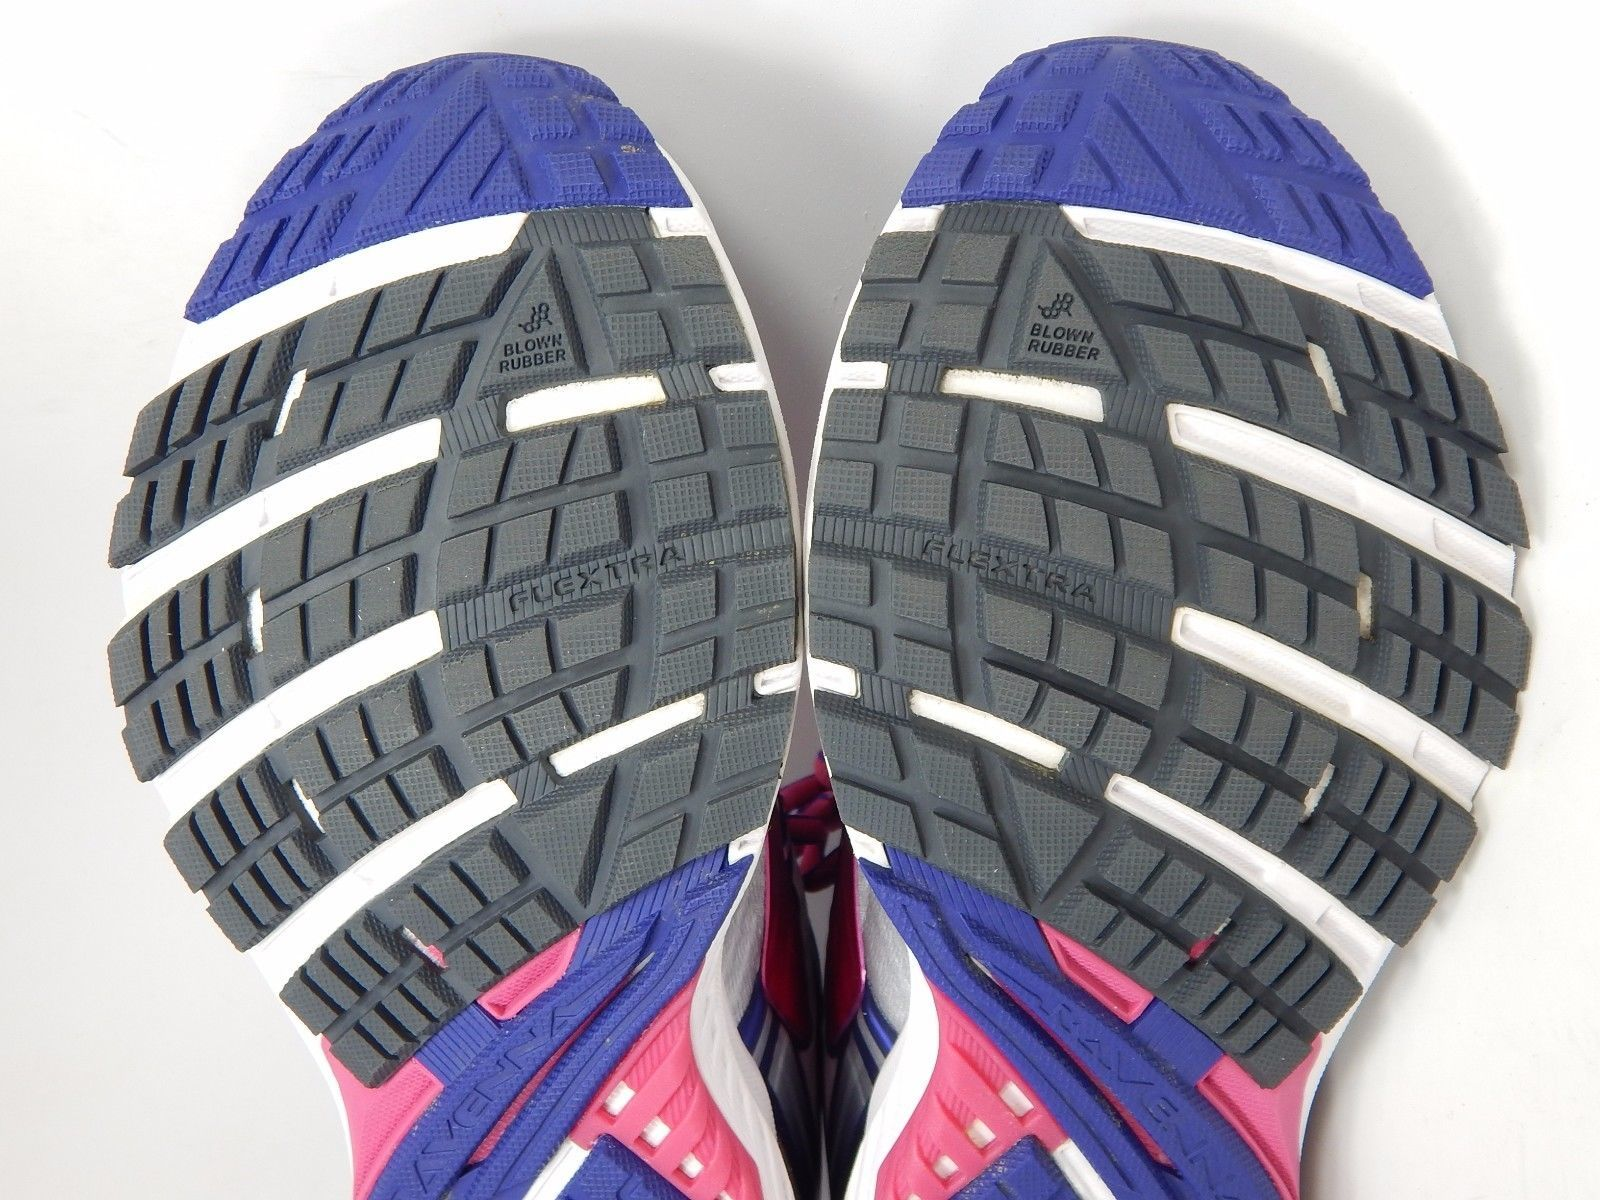 Brooks Ravenna 8 Women's Running Shoes Size US 8 M (B) EU: 39 Silver 1202381B089